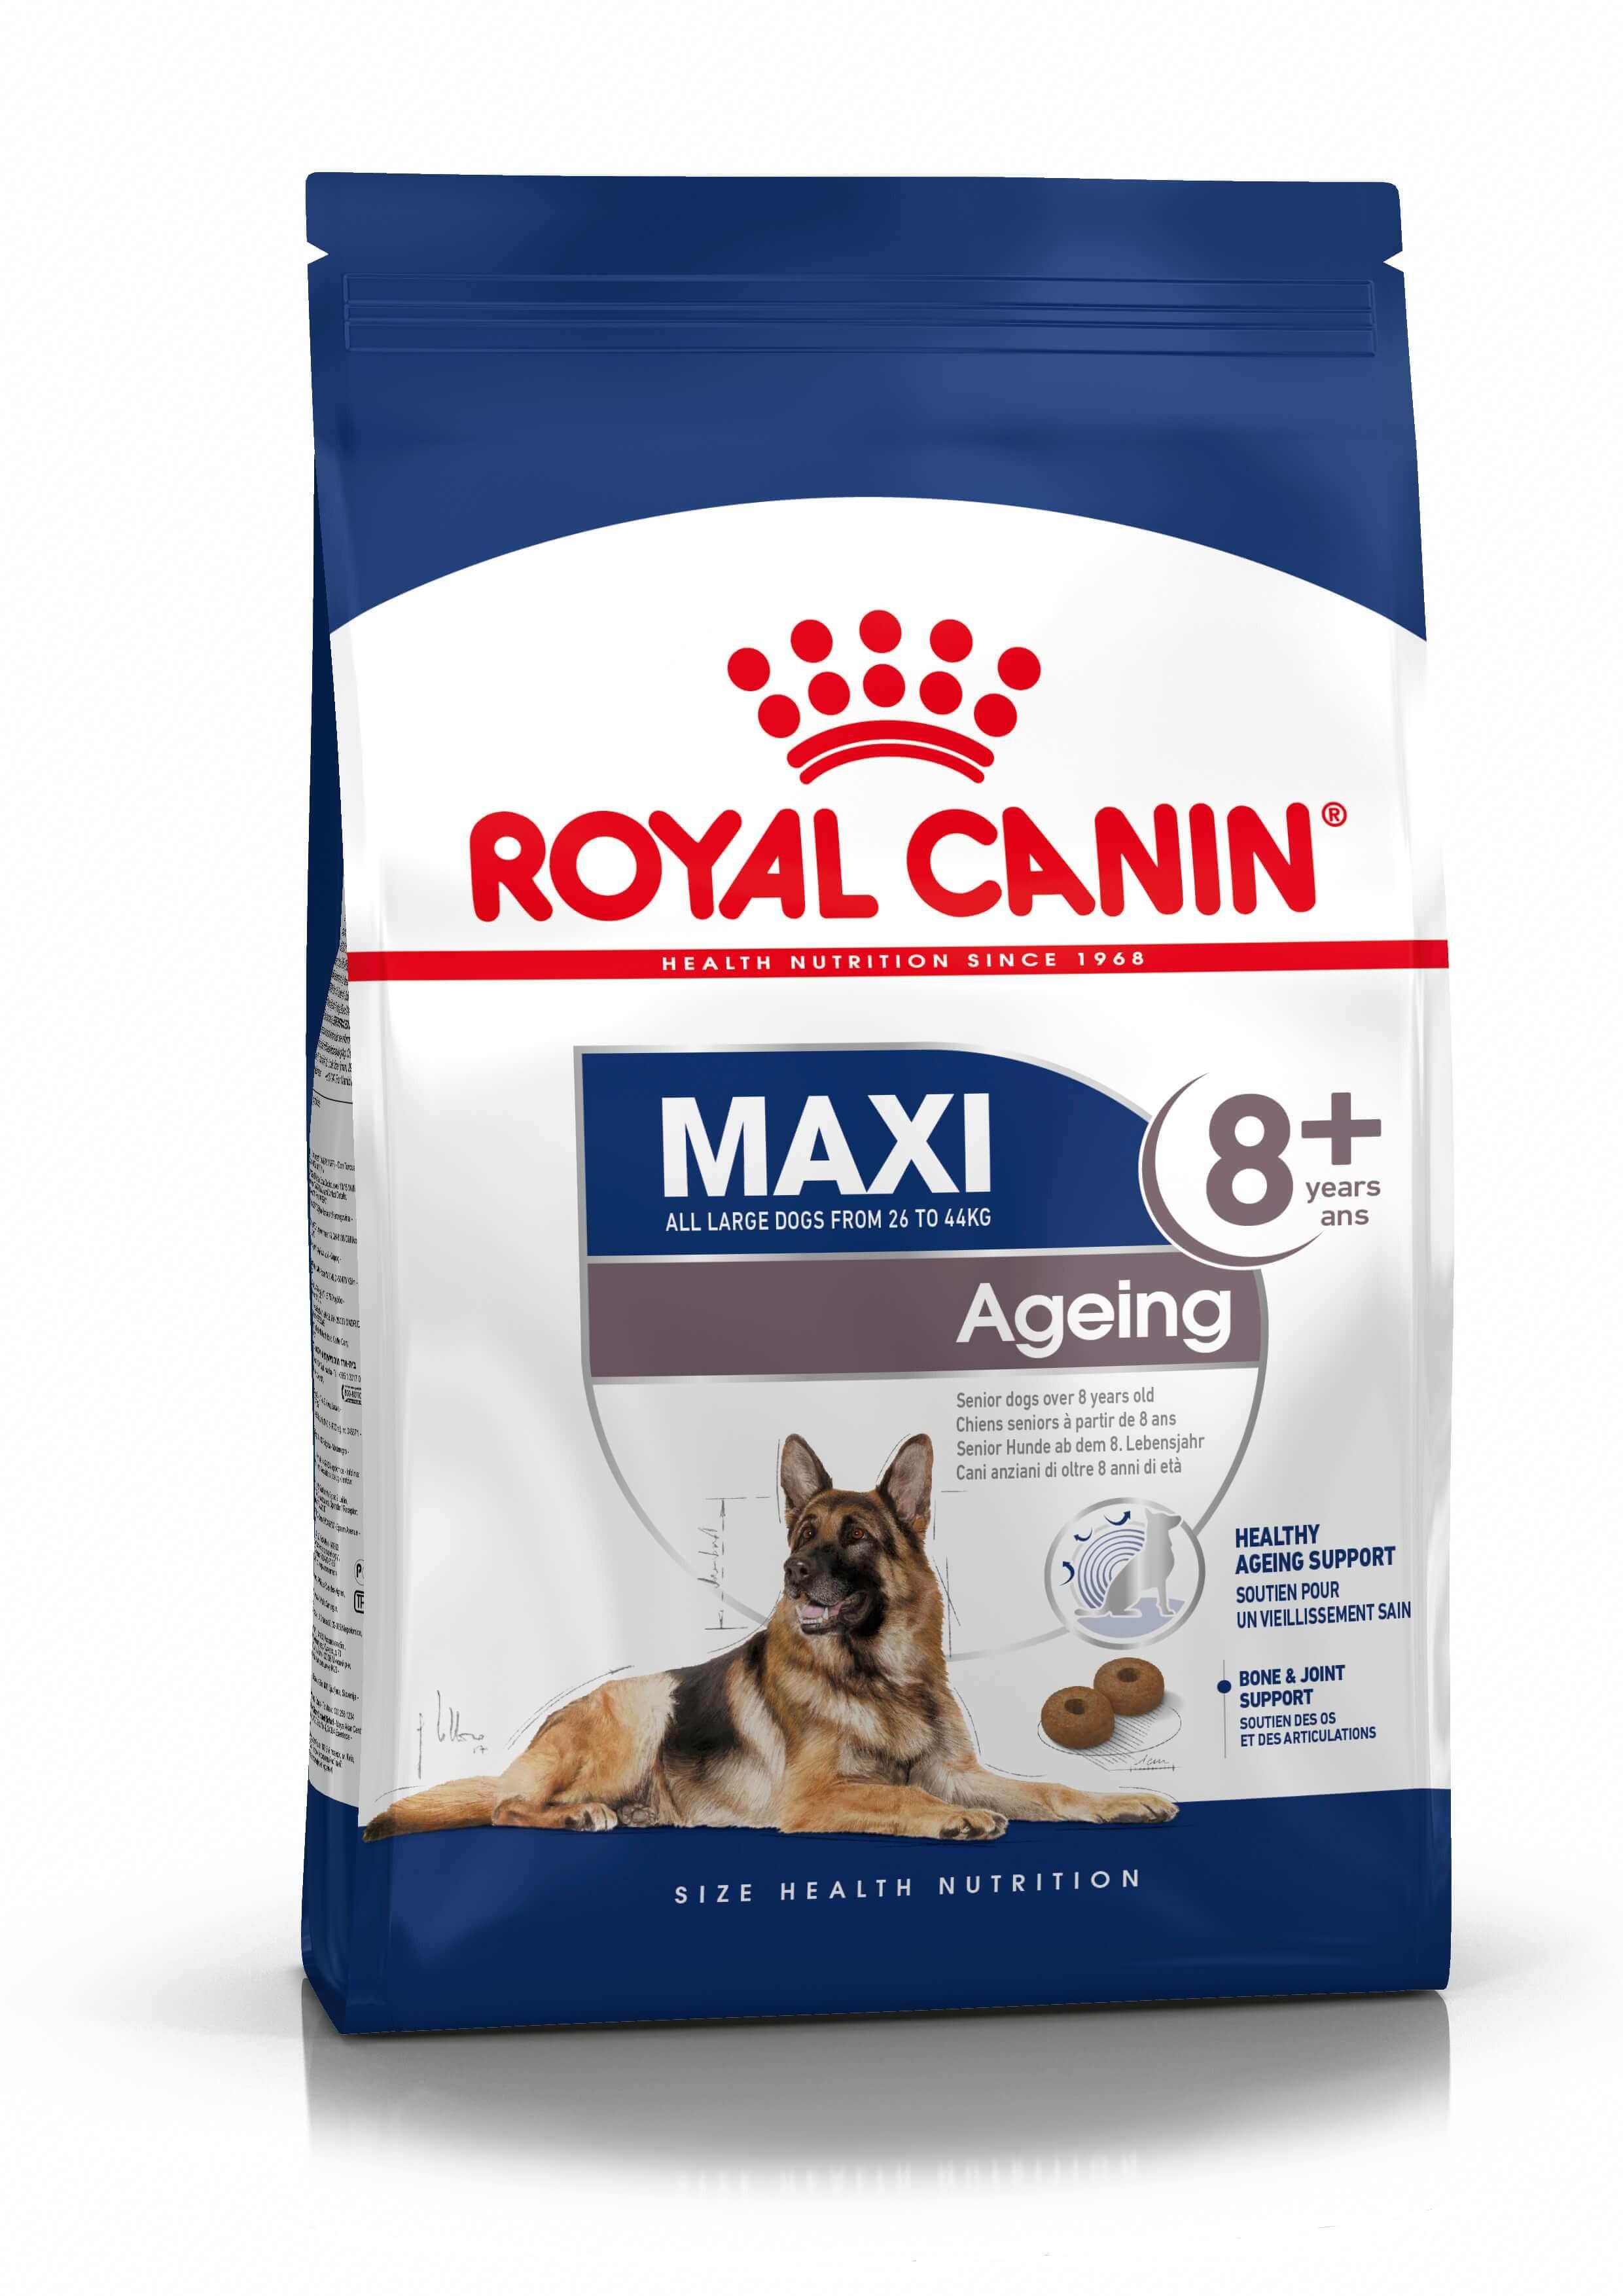 Royal canin Maxi Ageing 8+ hondenvoer